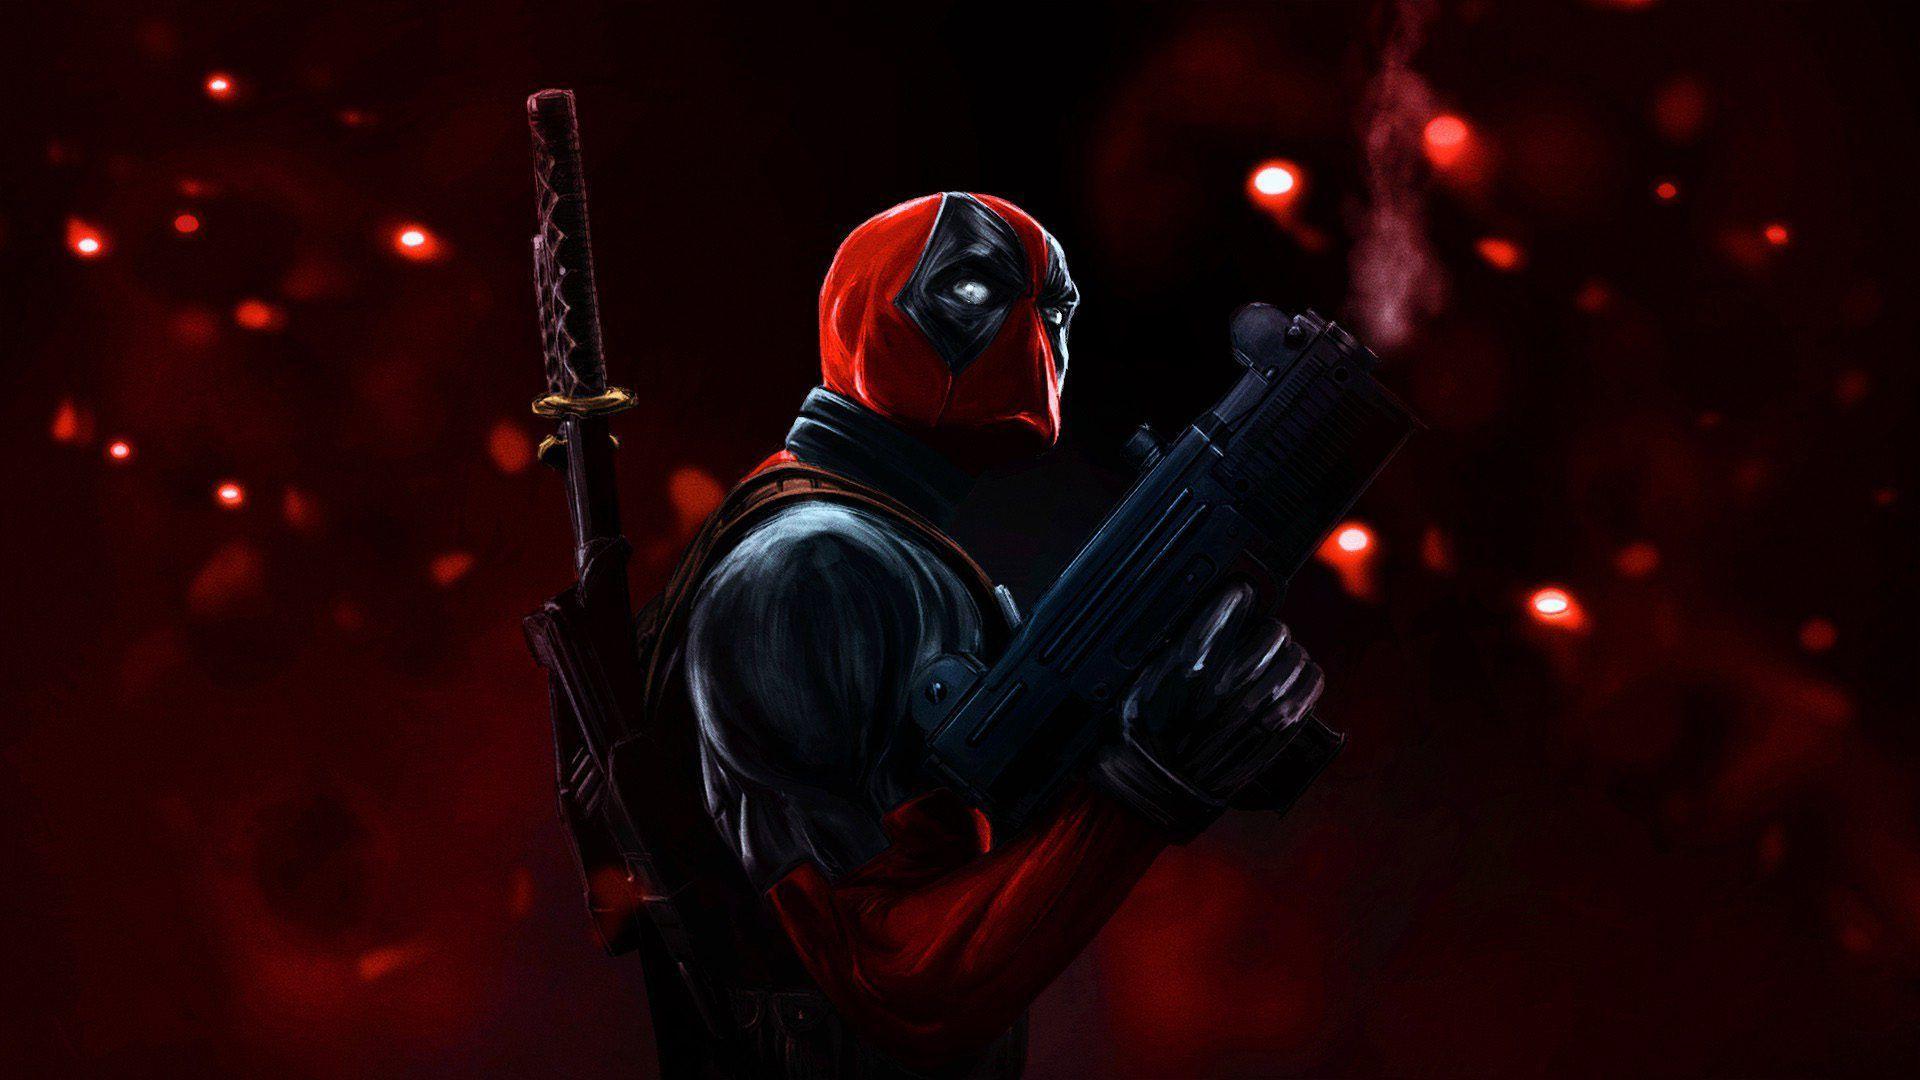 Top Free 4K Deadpool Backgrounds